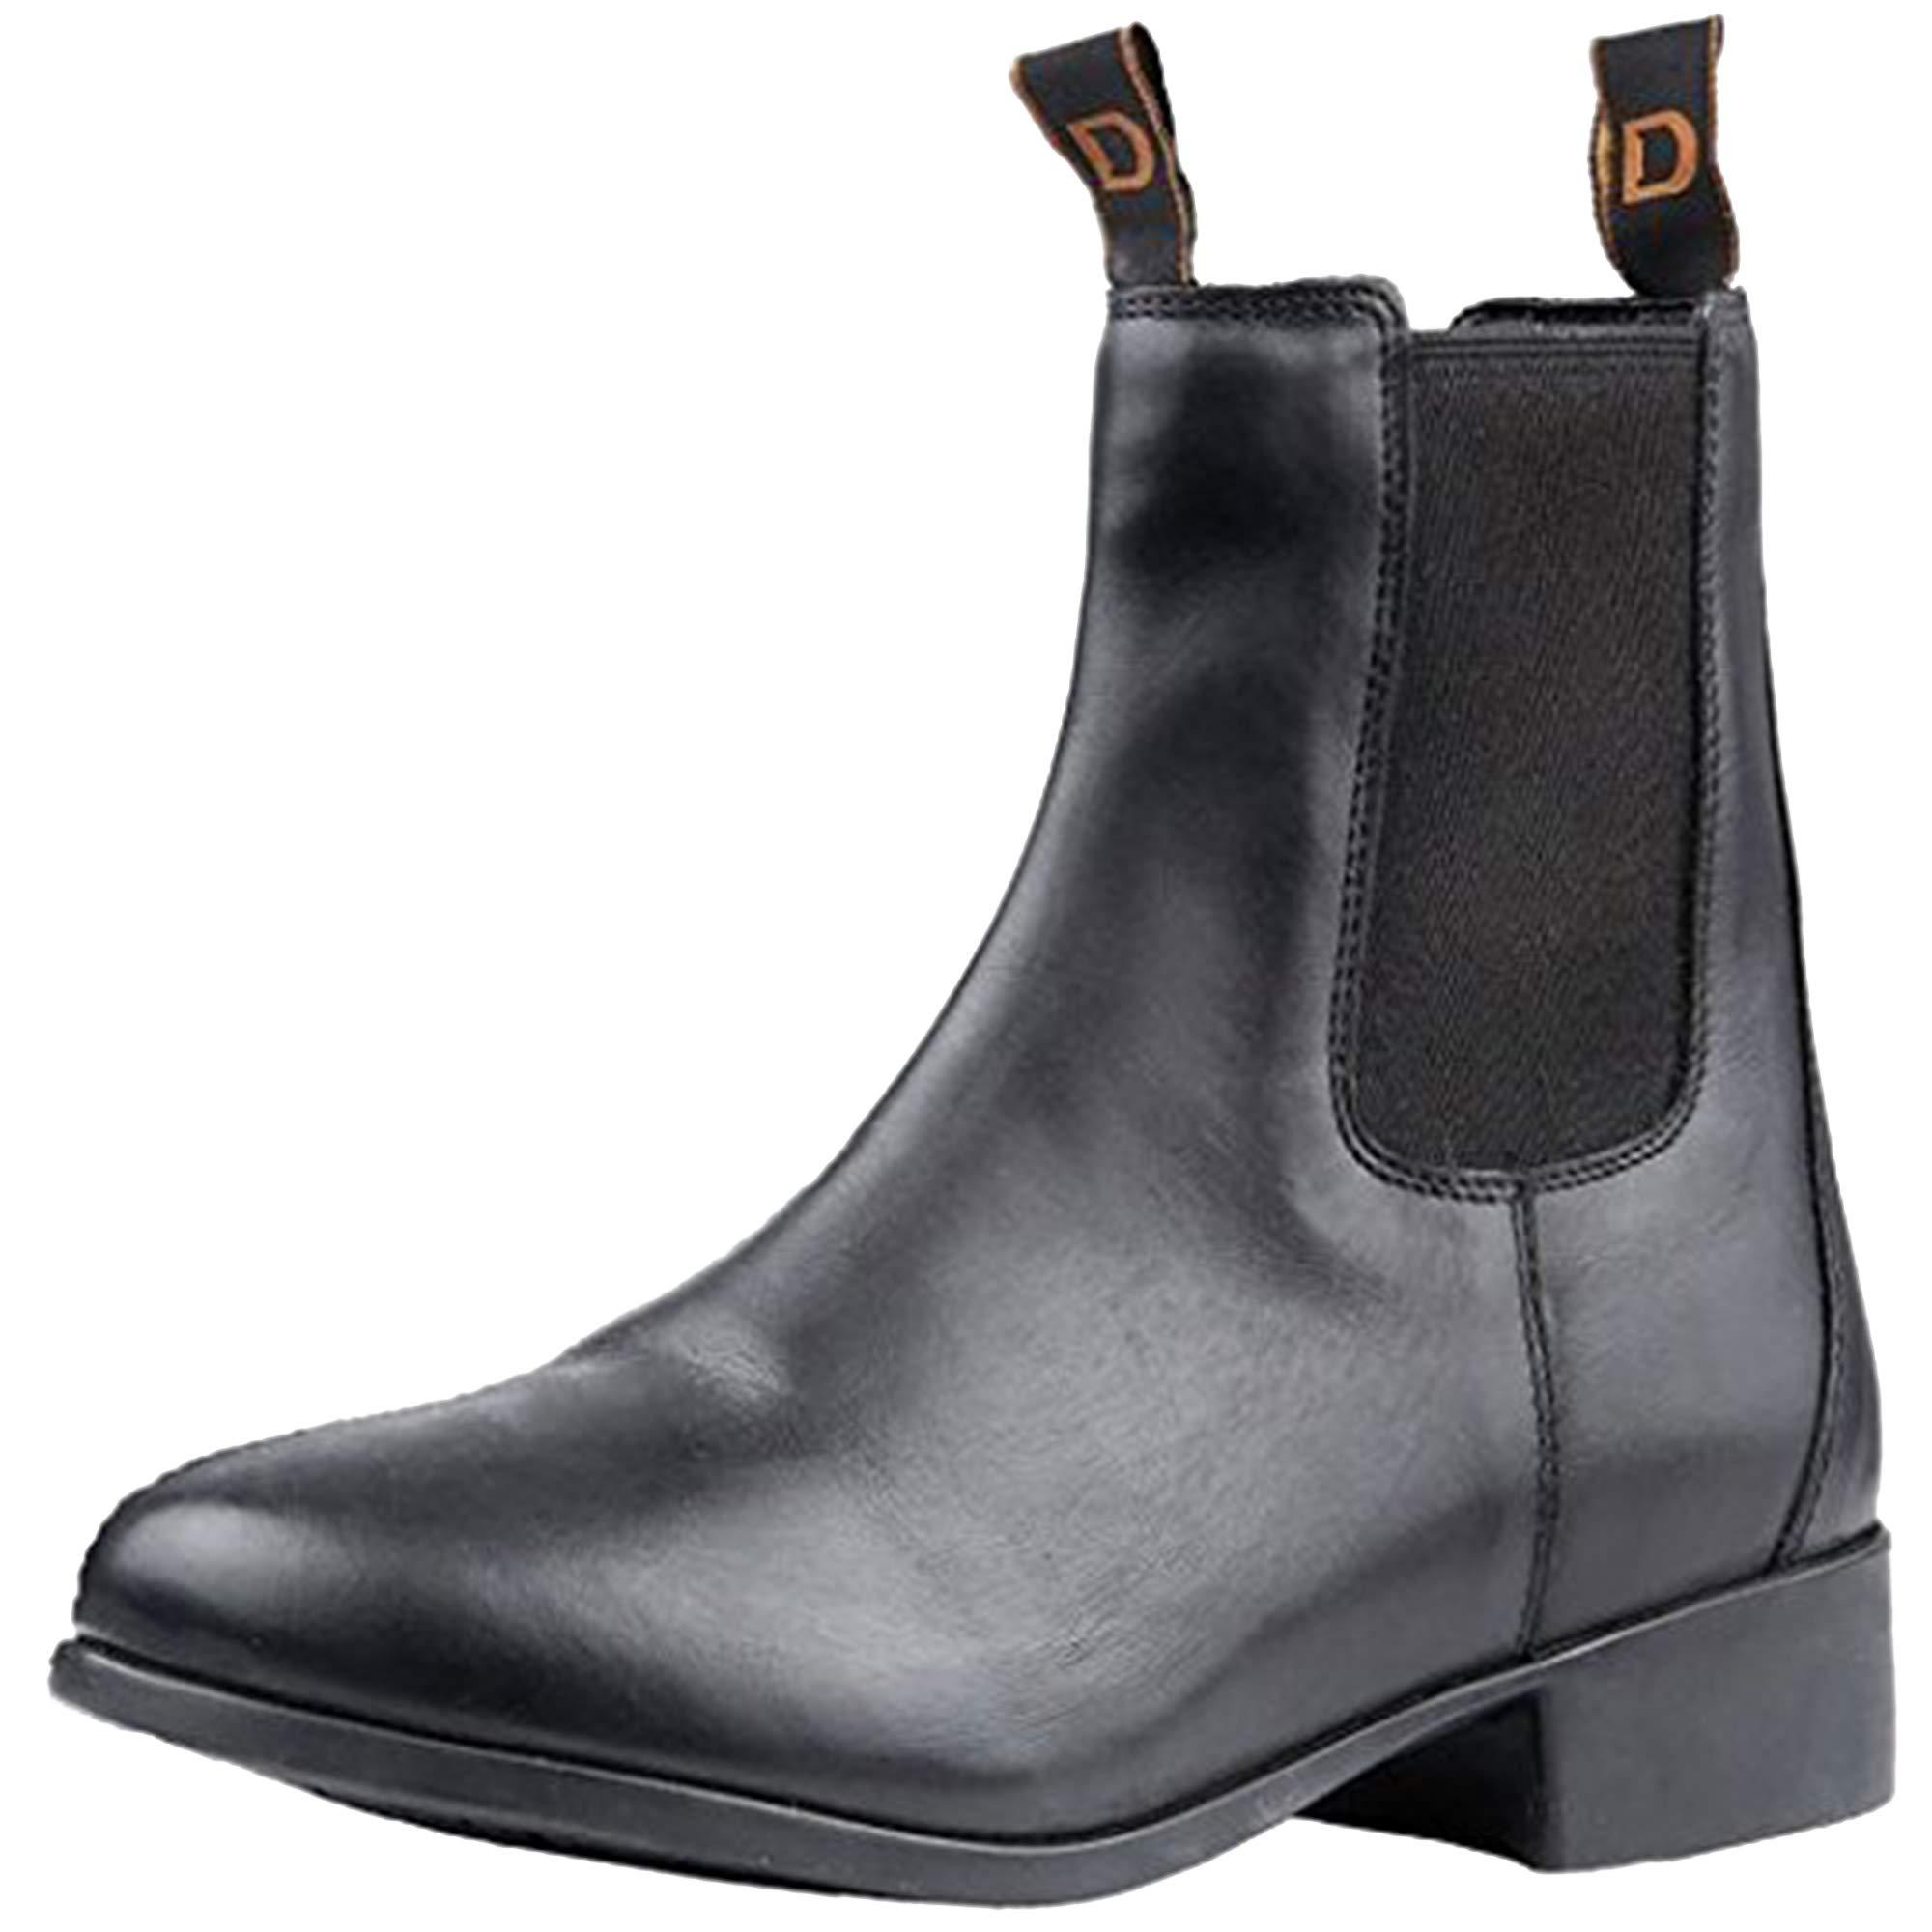 Dublin Childrens/Kids Elevation Jodhpur Boots (10 M US Toddler) (Black)